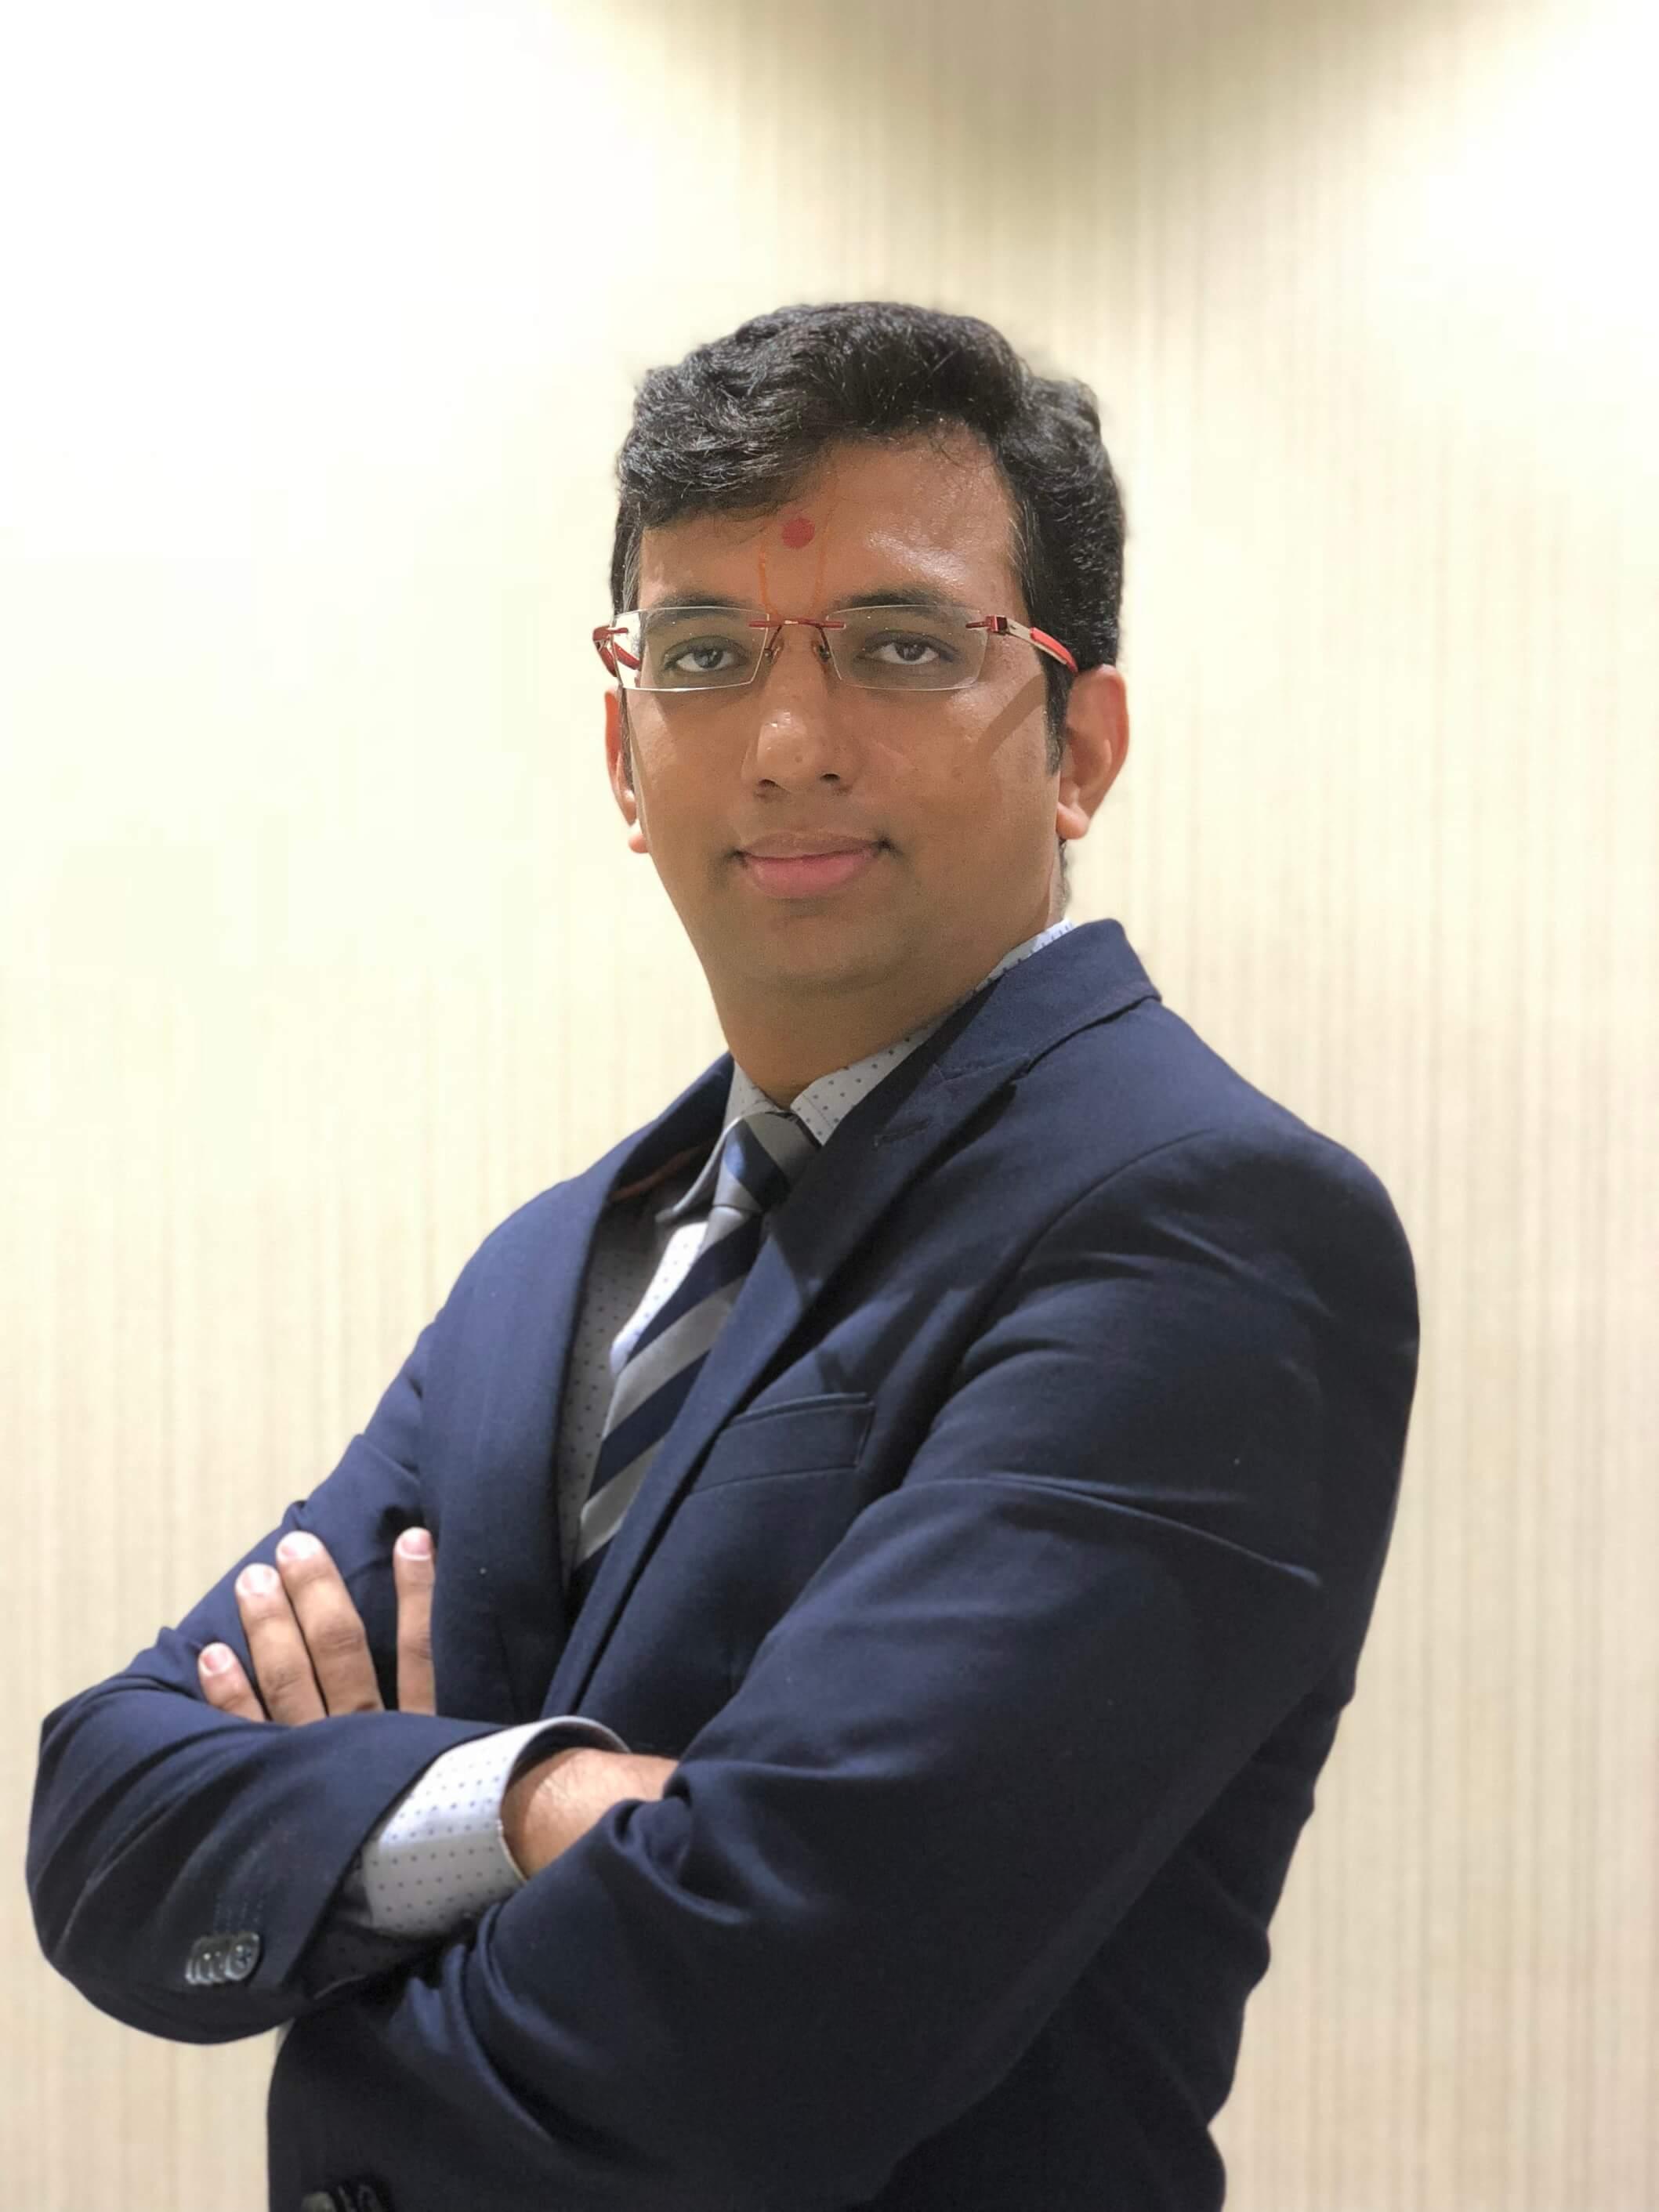 Vivek Mistry, manager, Aruba, a Hewlett Packard Enterprise company